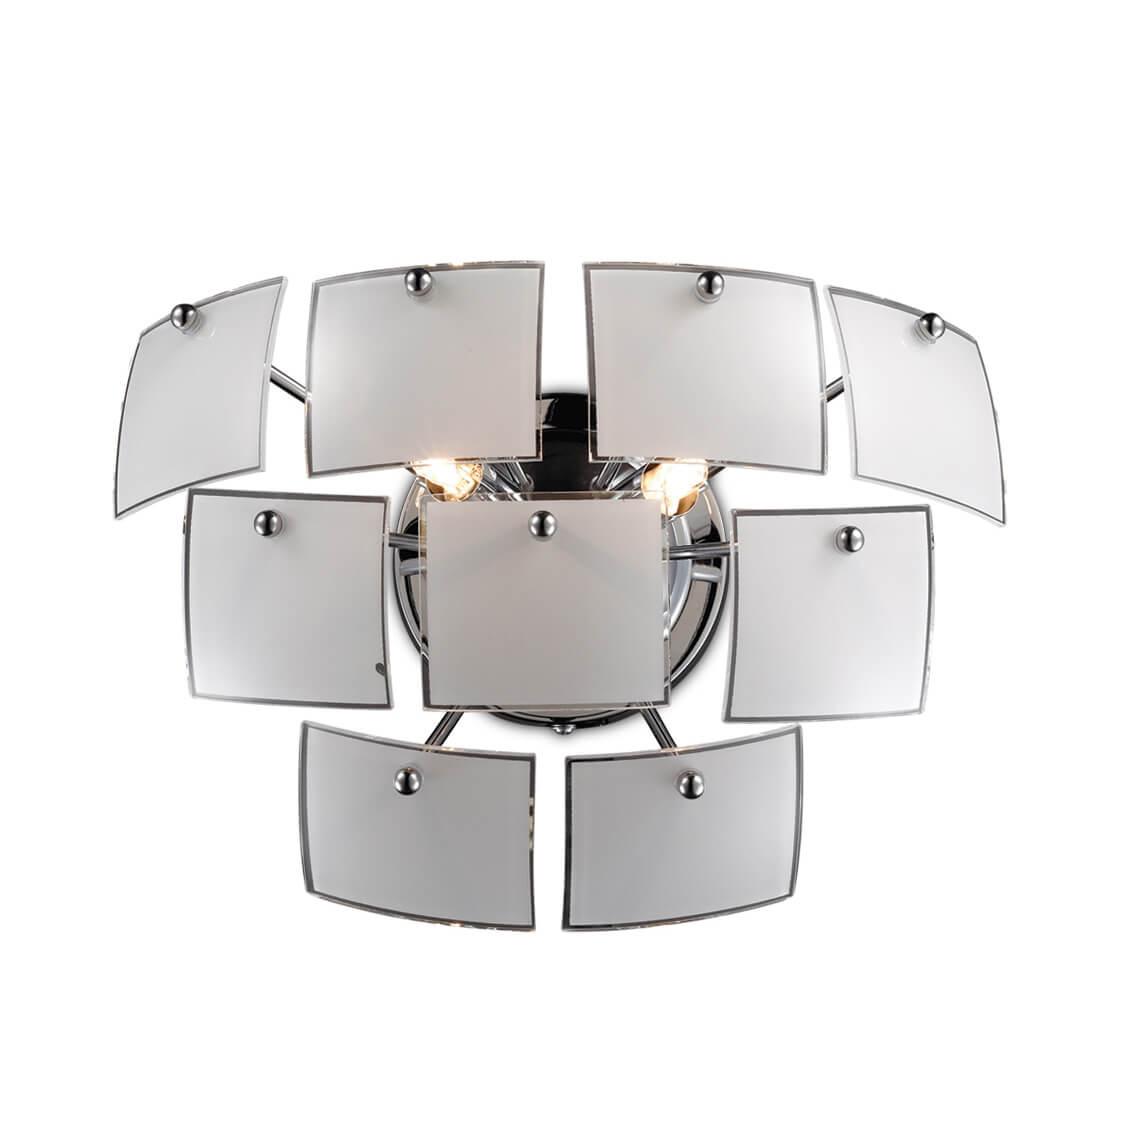 Бра Odeon Light Vorm 2655/2W odeon light 2231 2w odl12 631 хром хрусталь бра c выкл g9 2 40w 220v lola